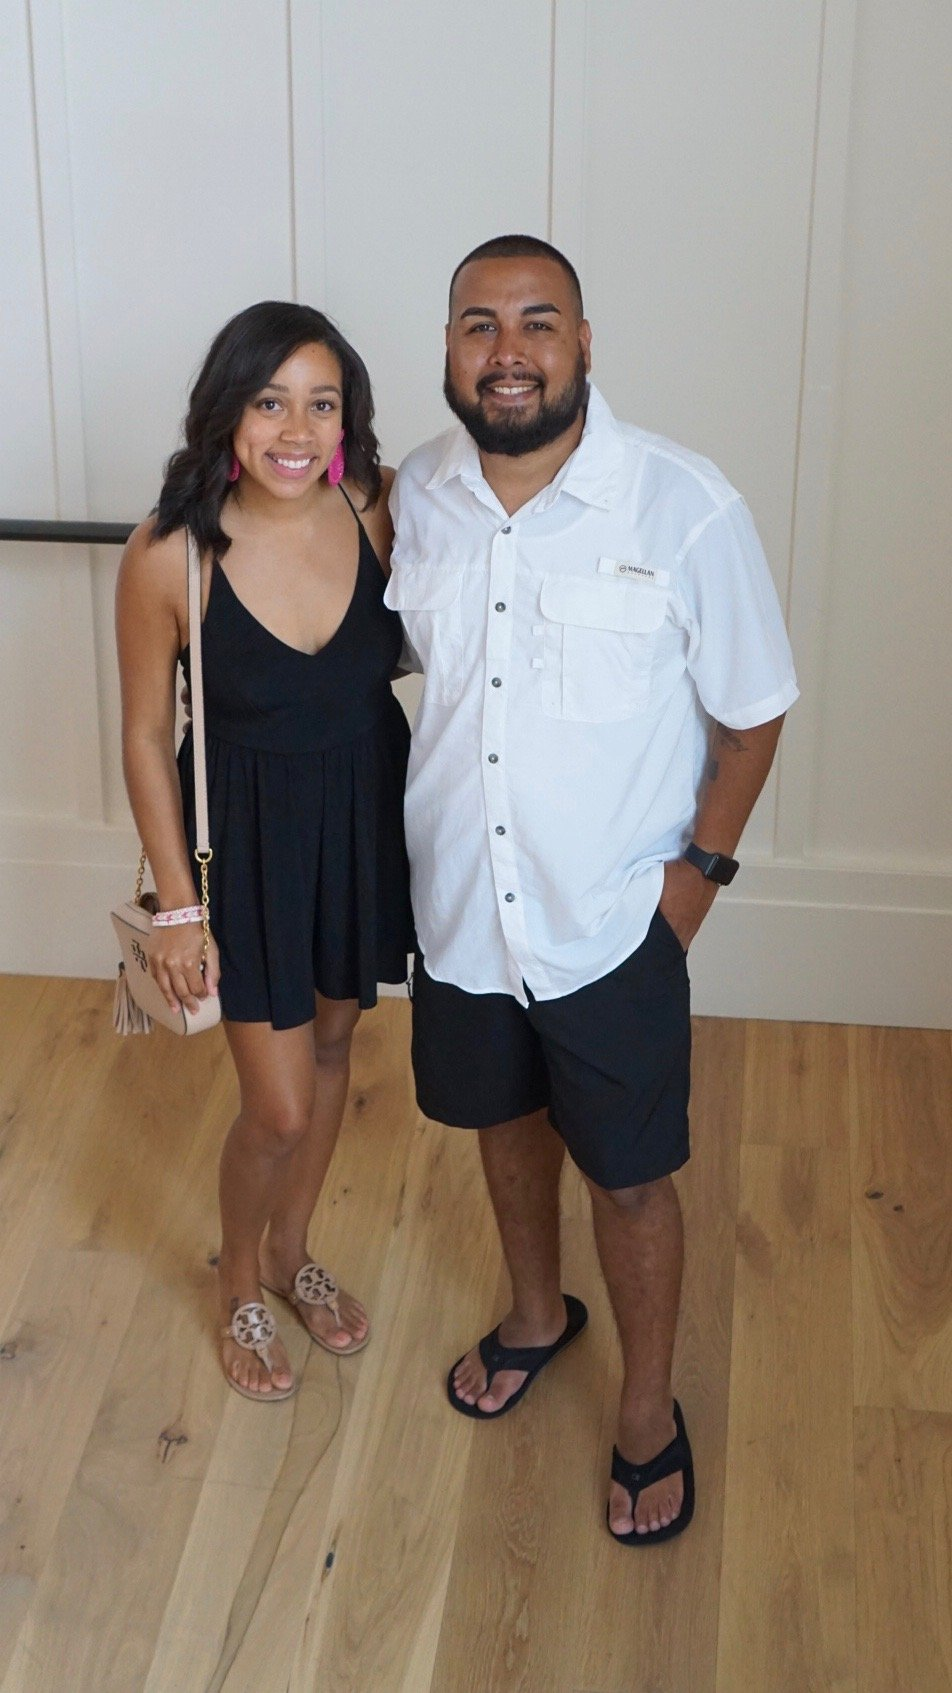 Couples at the Omni Barton Creek Resort & Spa in Austin